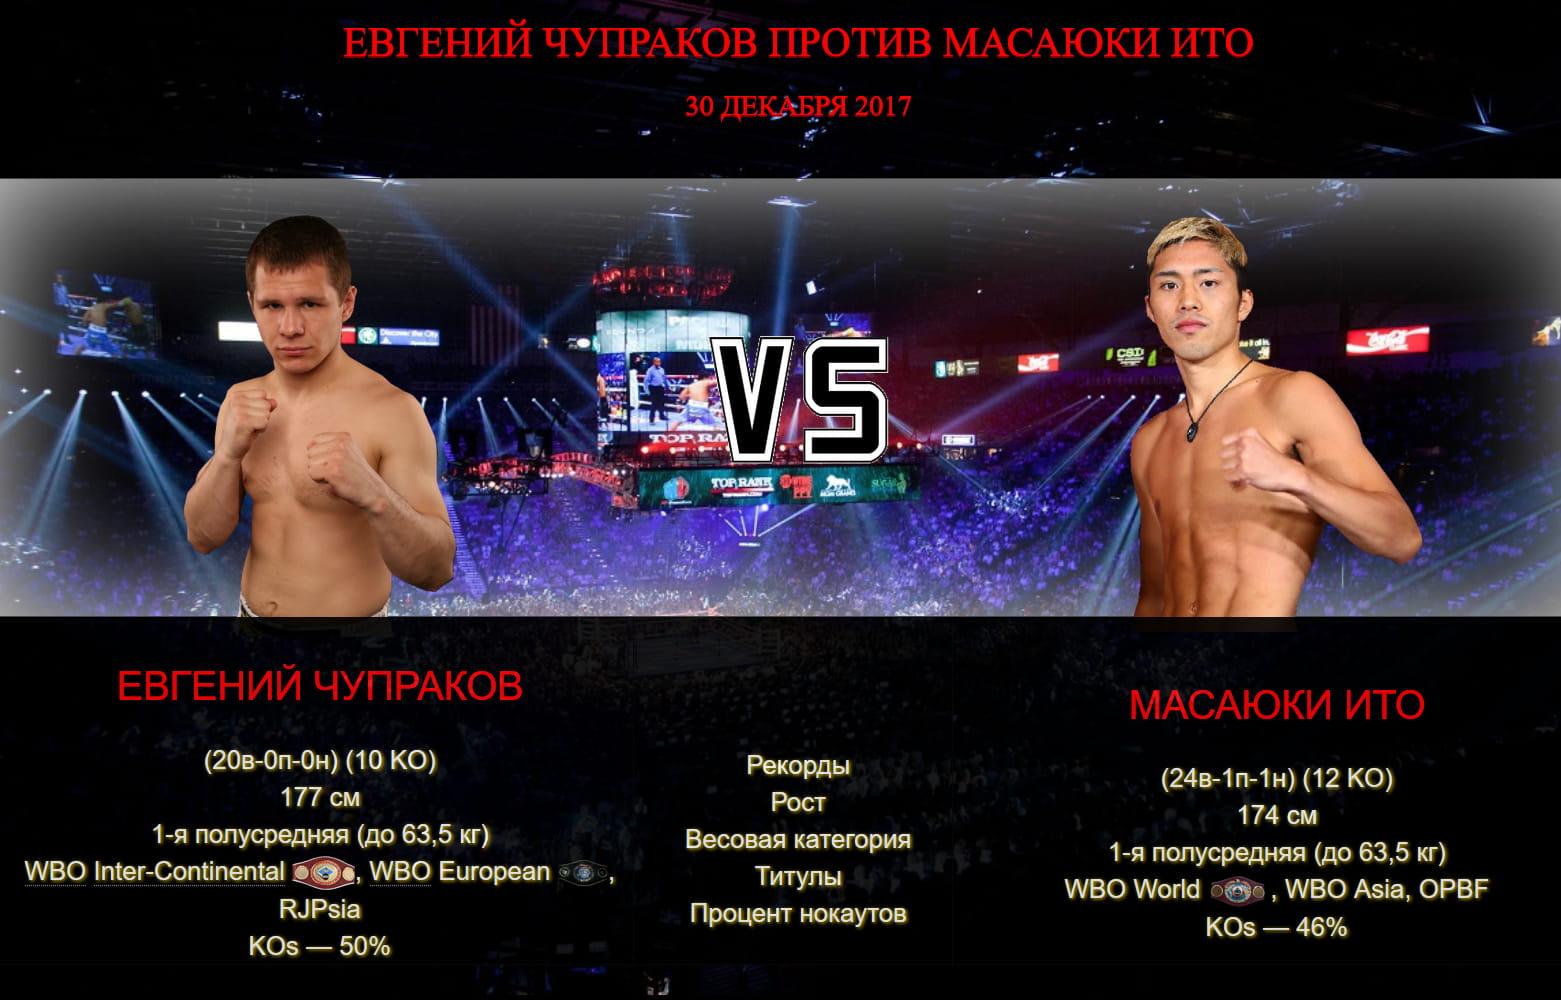 Афиша - бой Евгений Чупраков против Масаюки Ито